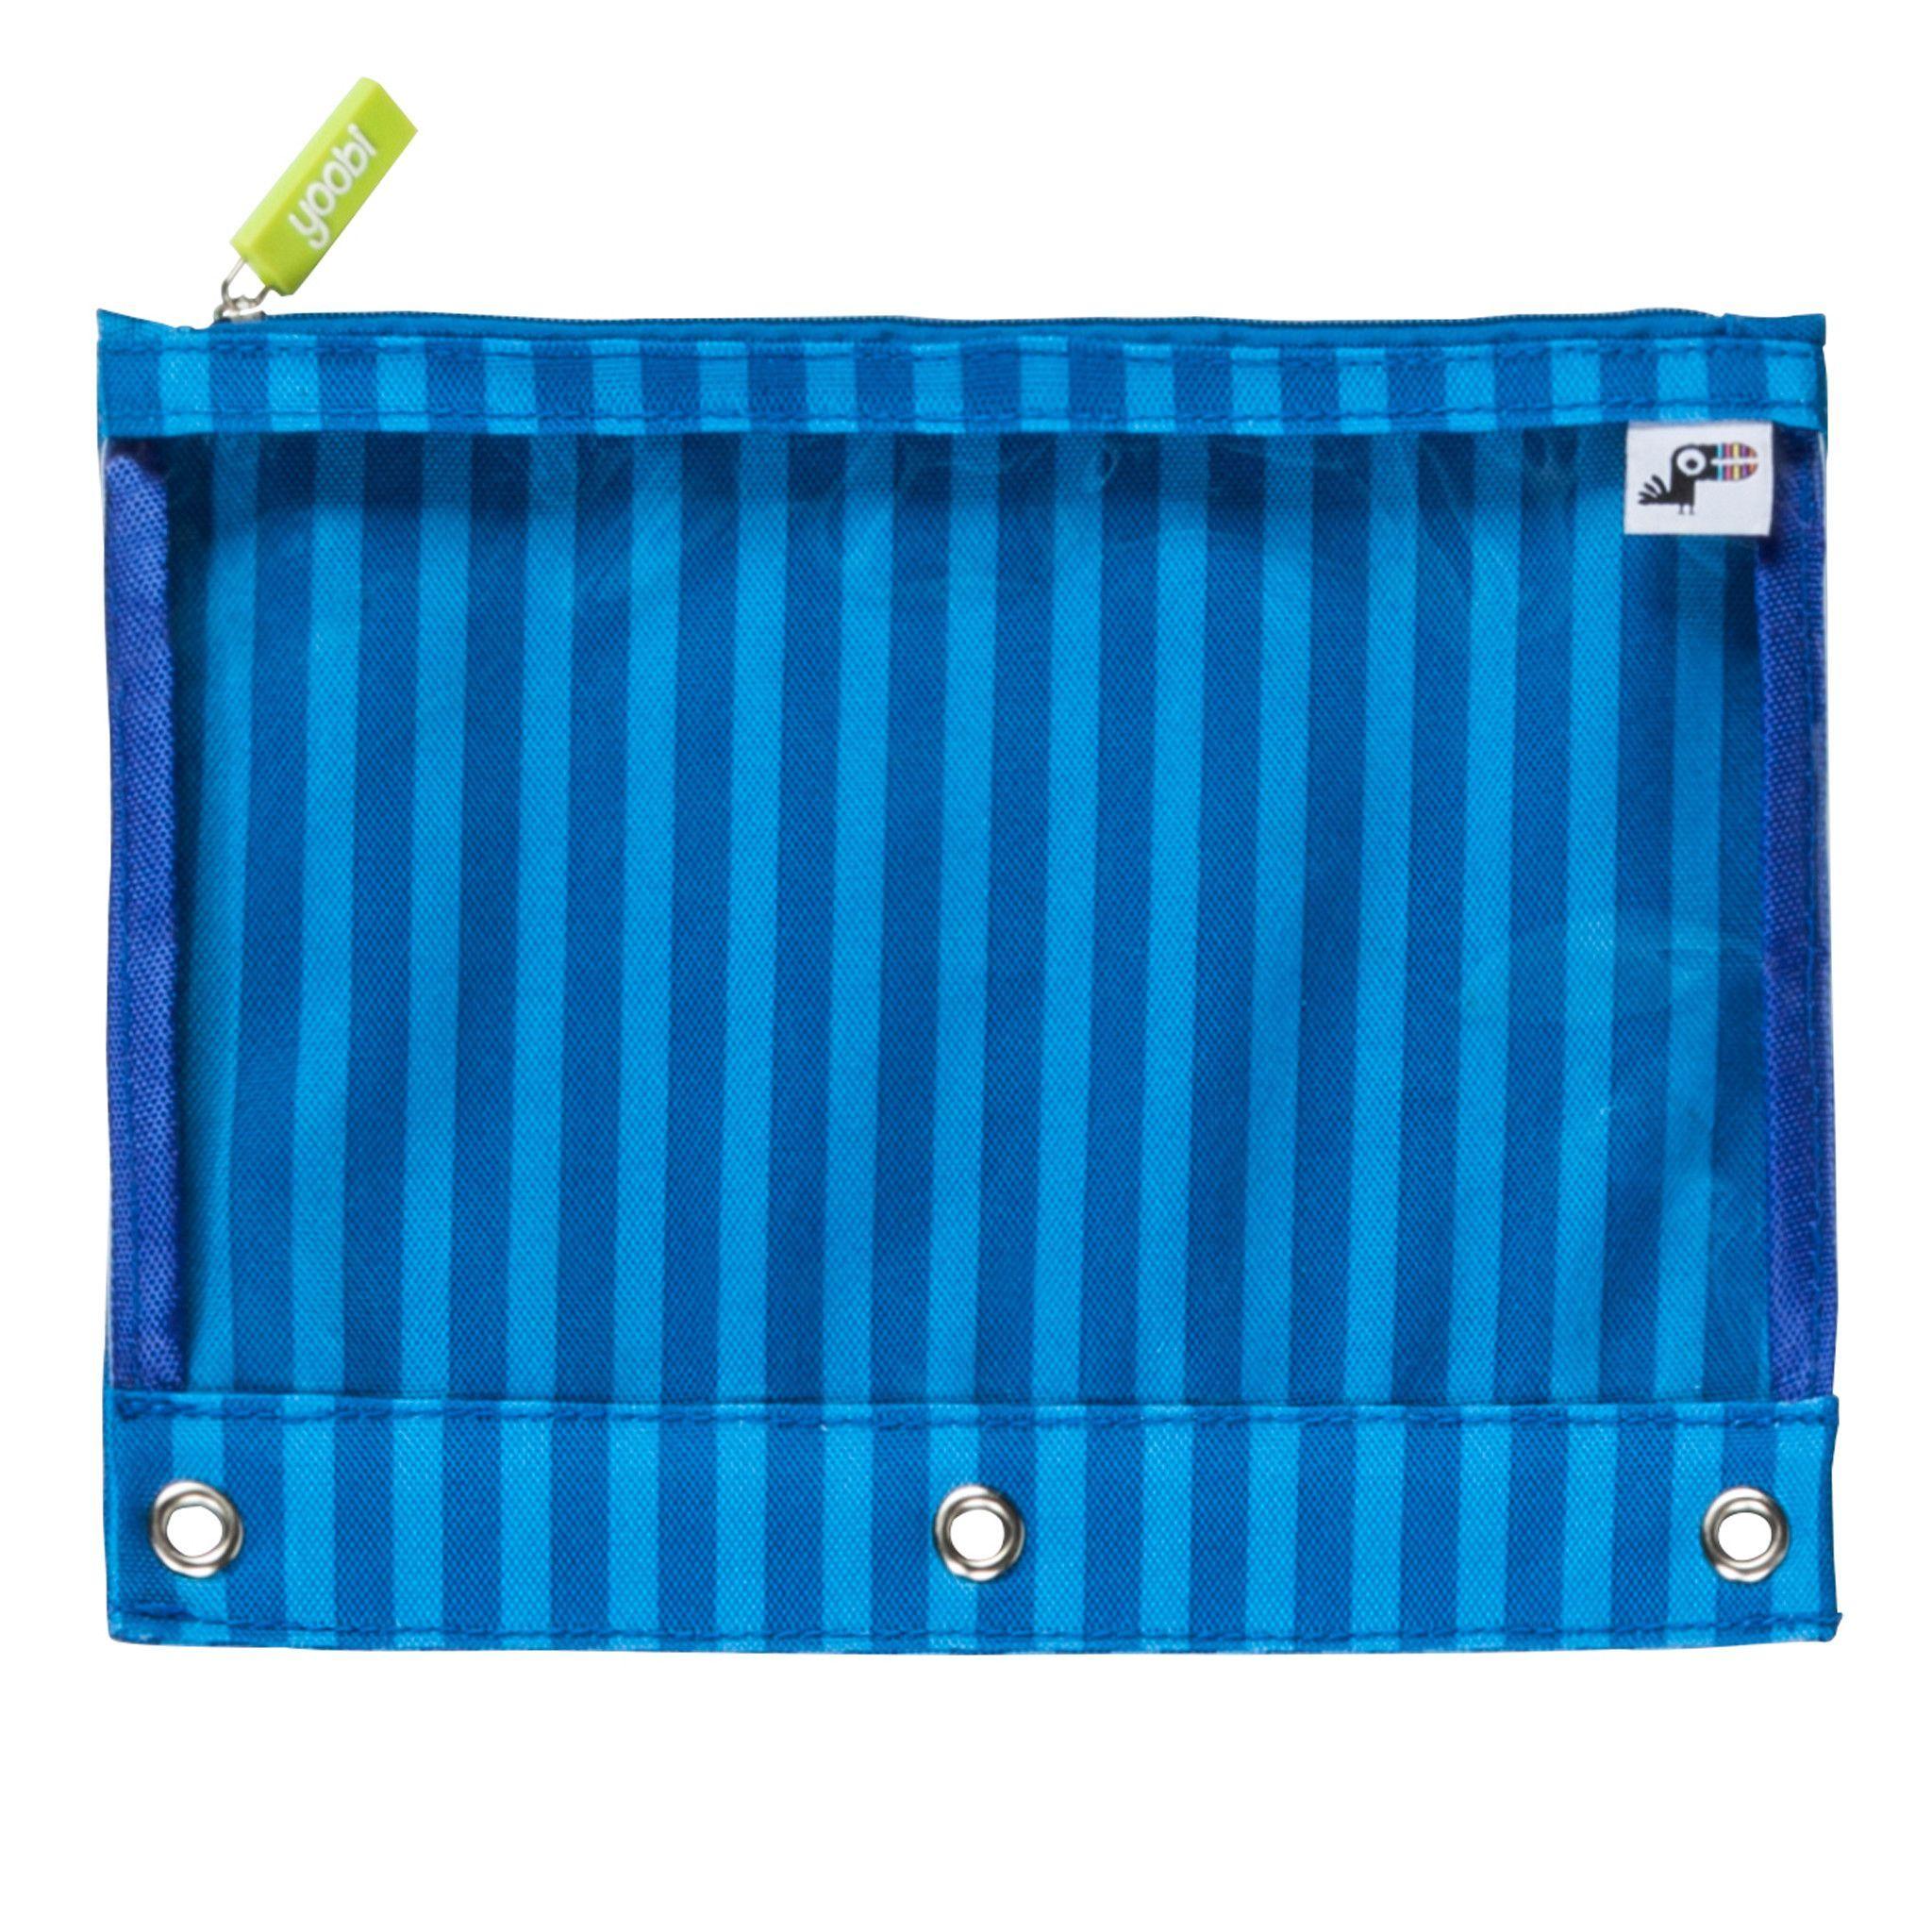 Binder Zip Case Blue Stripe All Things Yoobi Pencil Bags